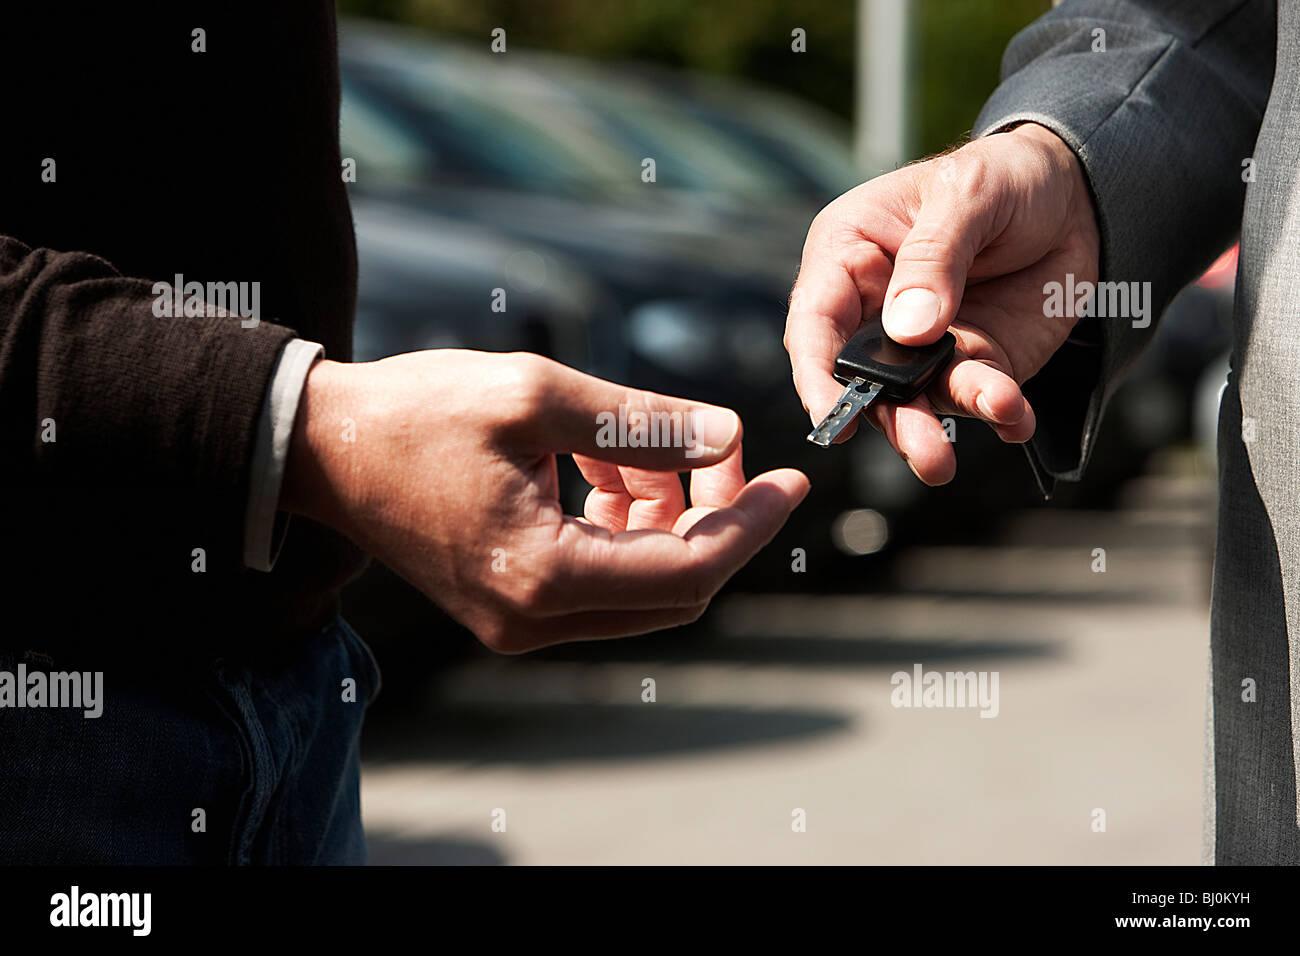 close-up of salesman at car dealer handing out car key to customer - Stock Image